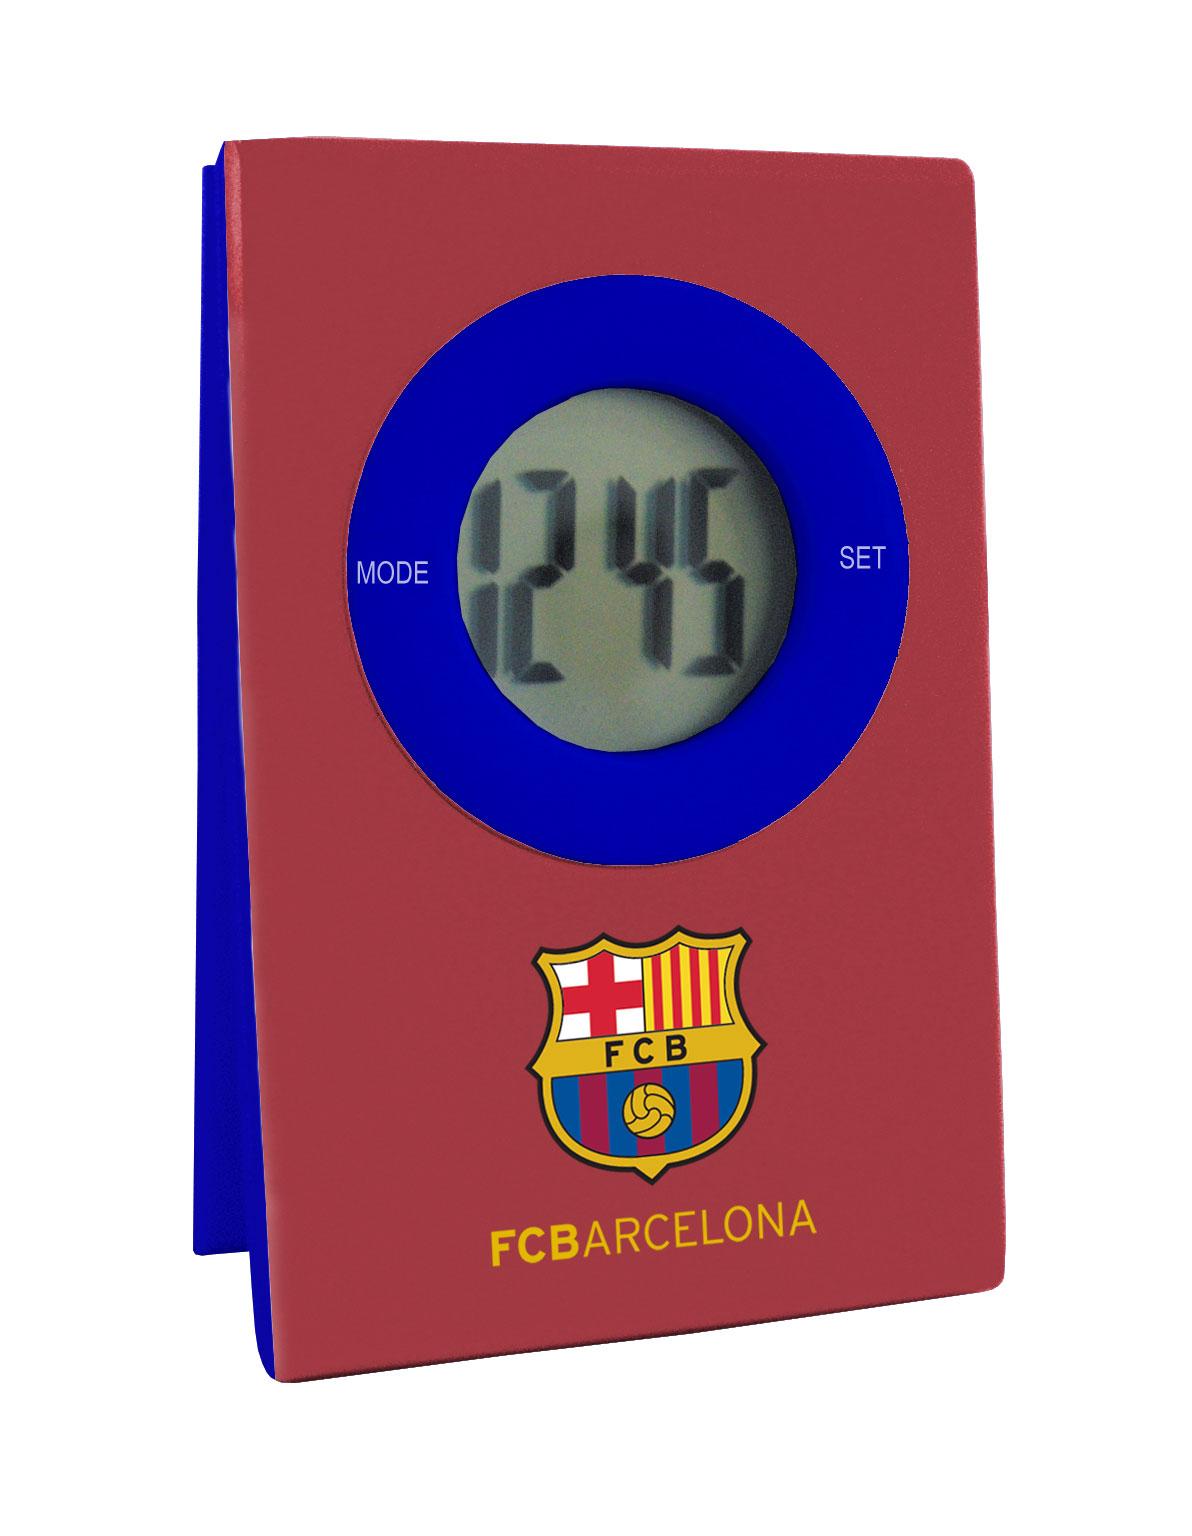 RELOJ DE MESA CLIP DIGITAL 710816 BARCELONA